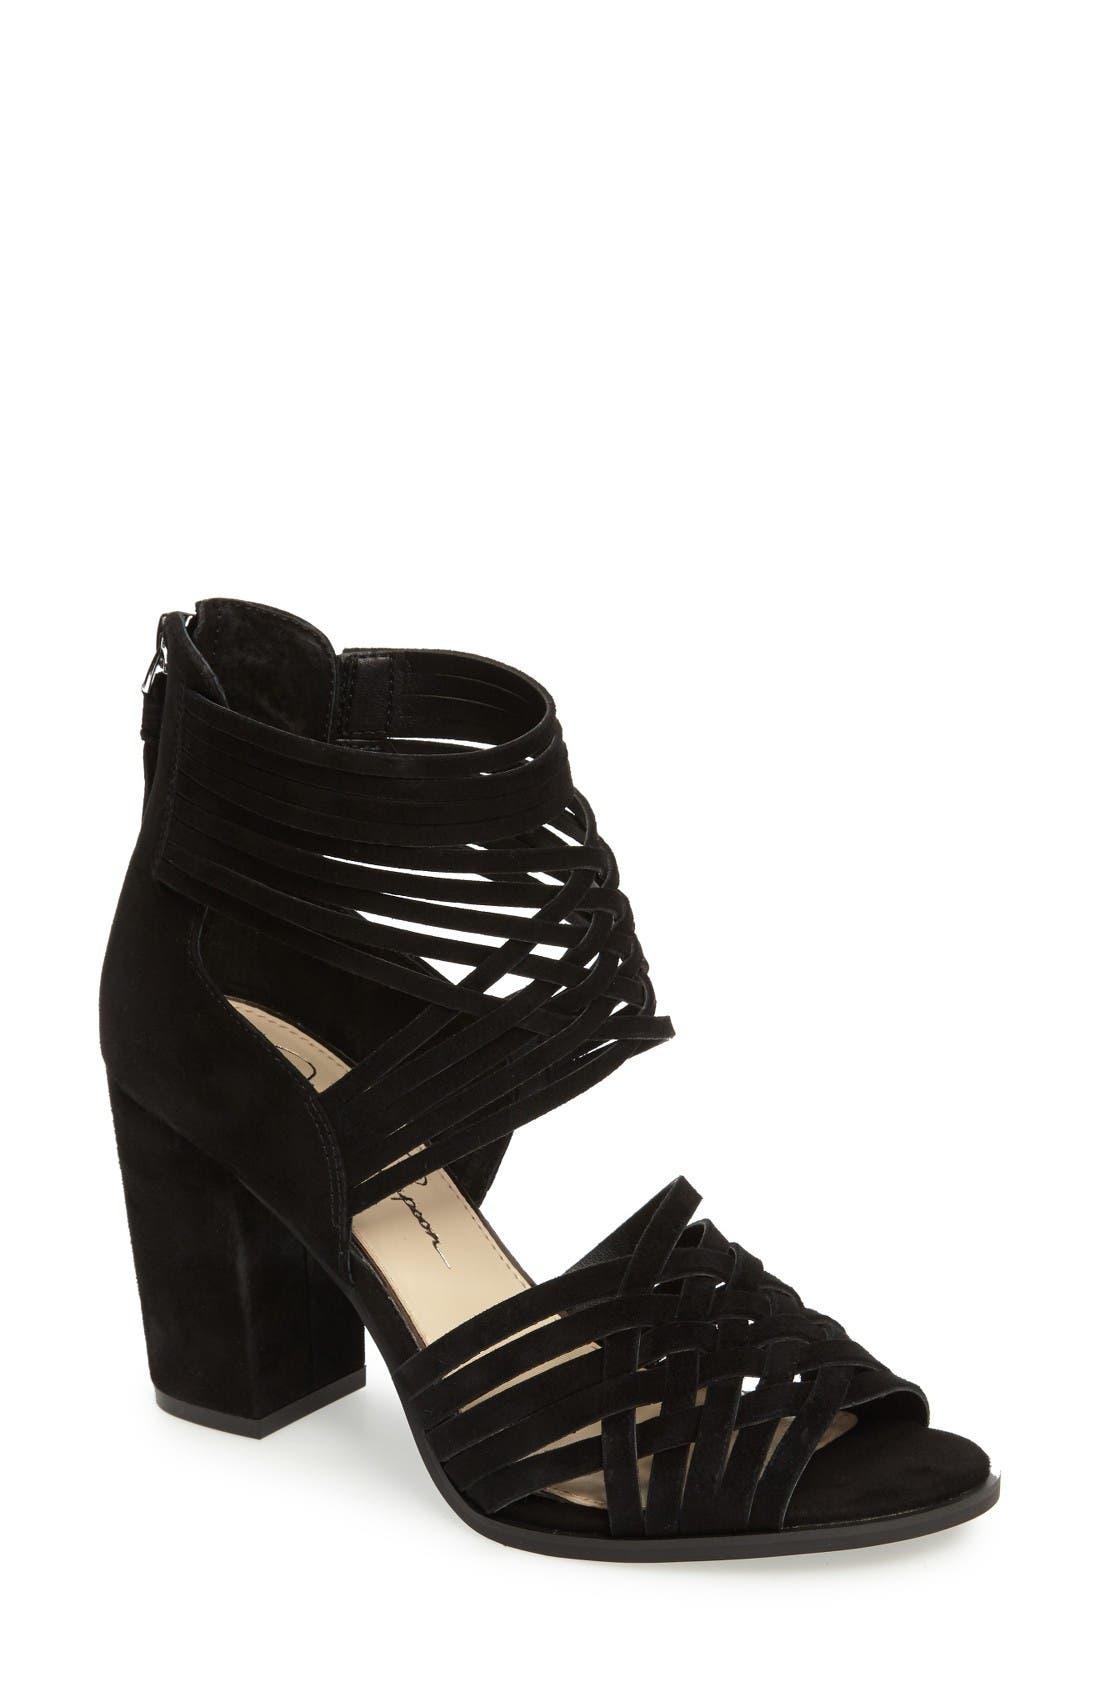 Reilynn Woven Sandal,                             Main thumbnail 1, color,                             Black Suede